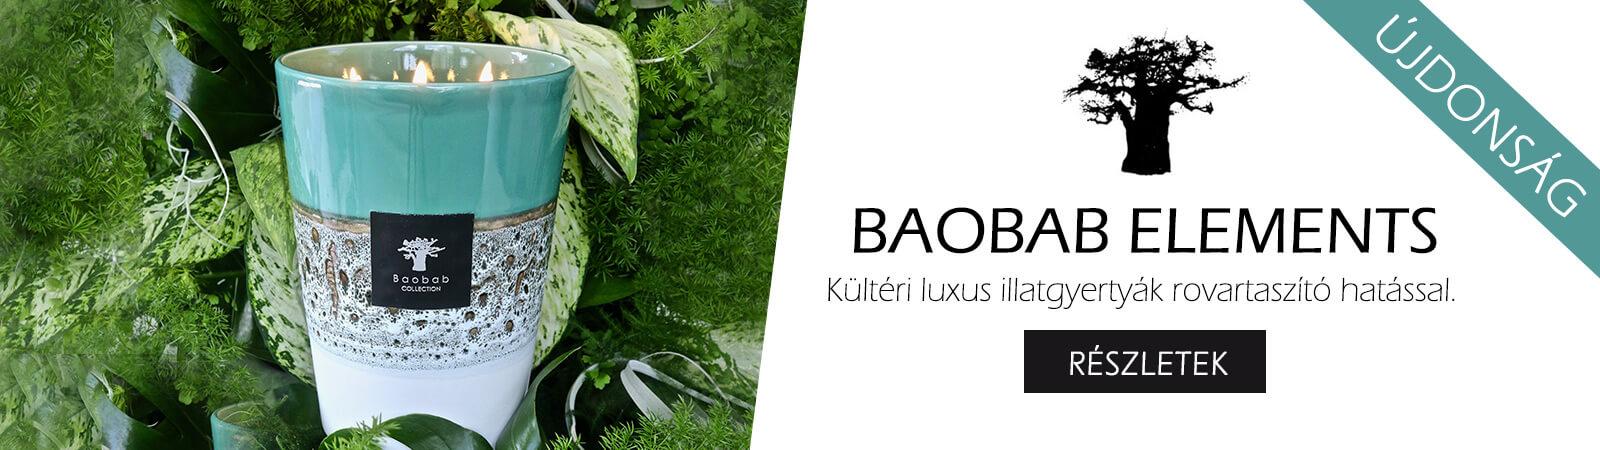 Baobab Elements